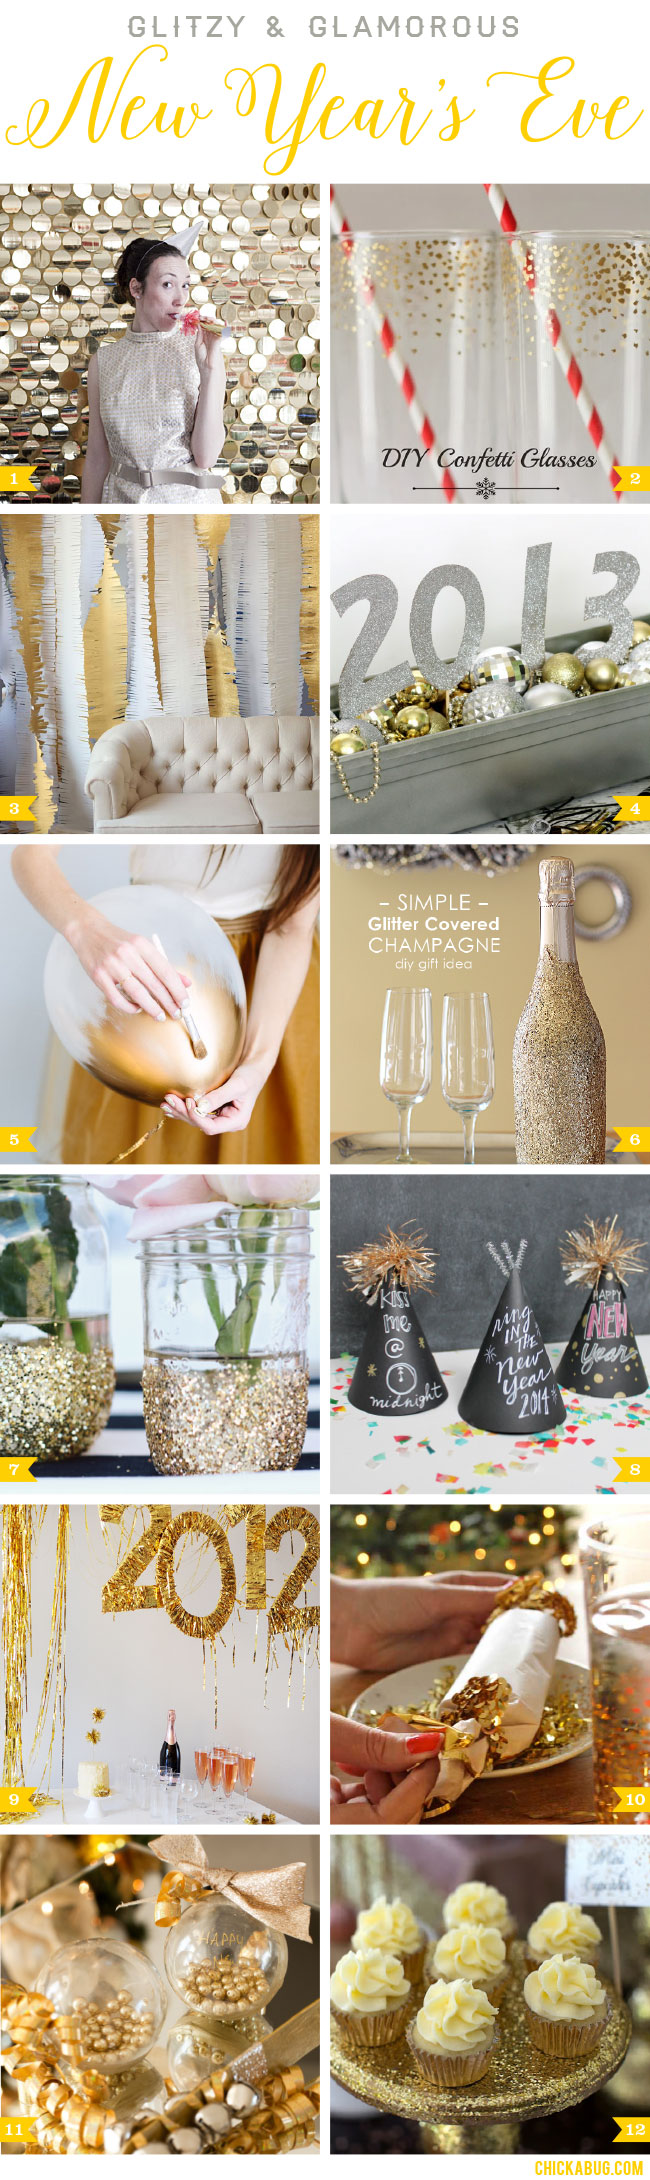 Glitzy and glamorous DIY New Year's Eve ideas